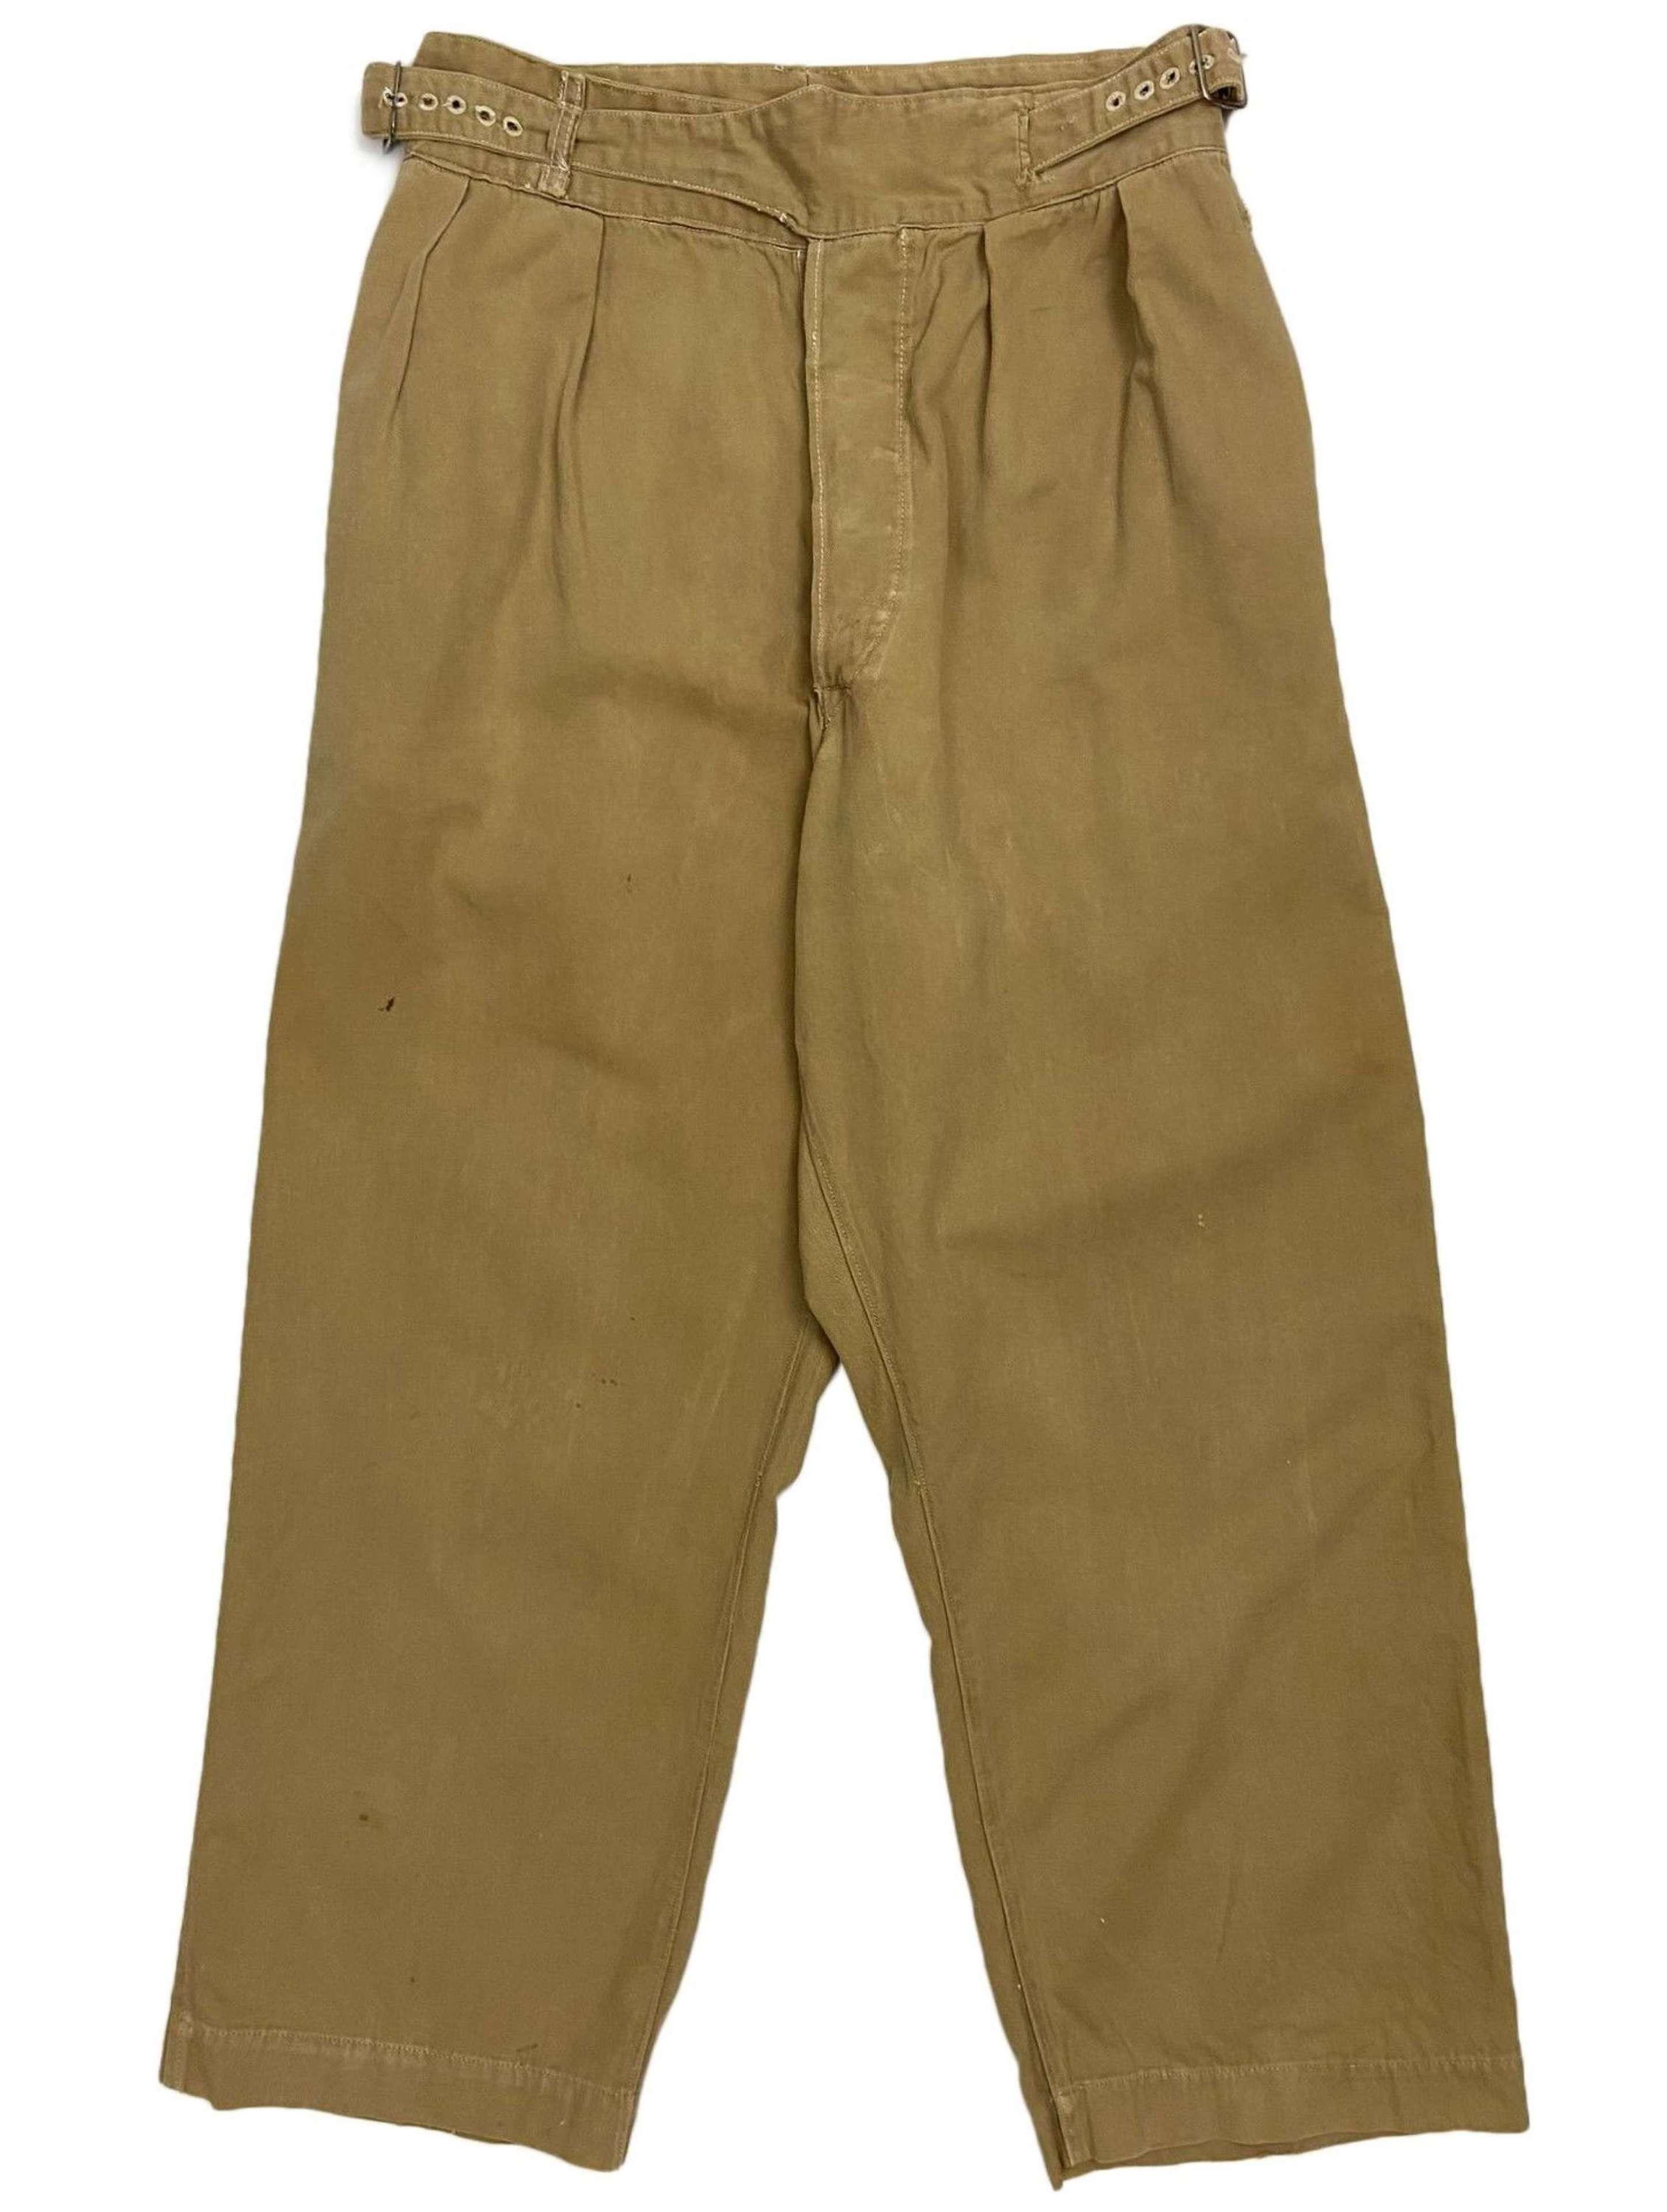 Original late WW2 British Army Khaki Drill Trousers